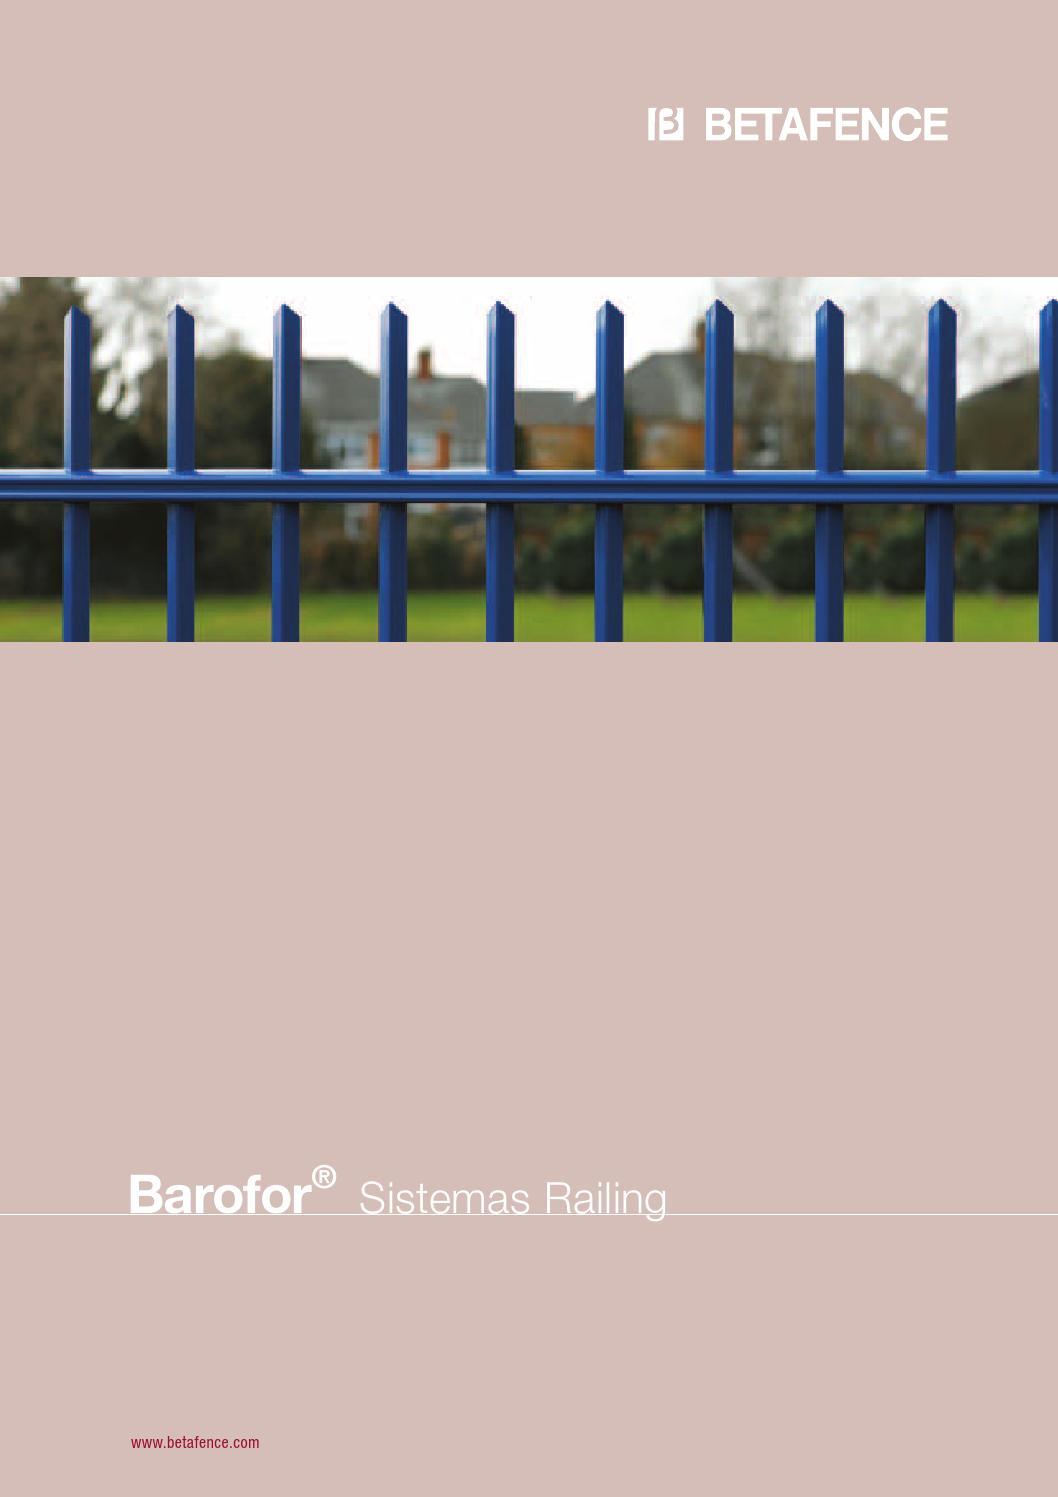 barofor es 2012 by betafence corporate services nv issuu. Black Bedroom Furniture Sets. Home Design Ideas